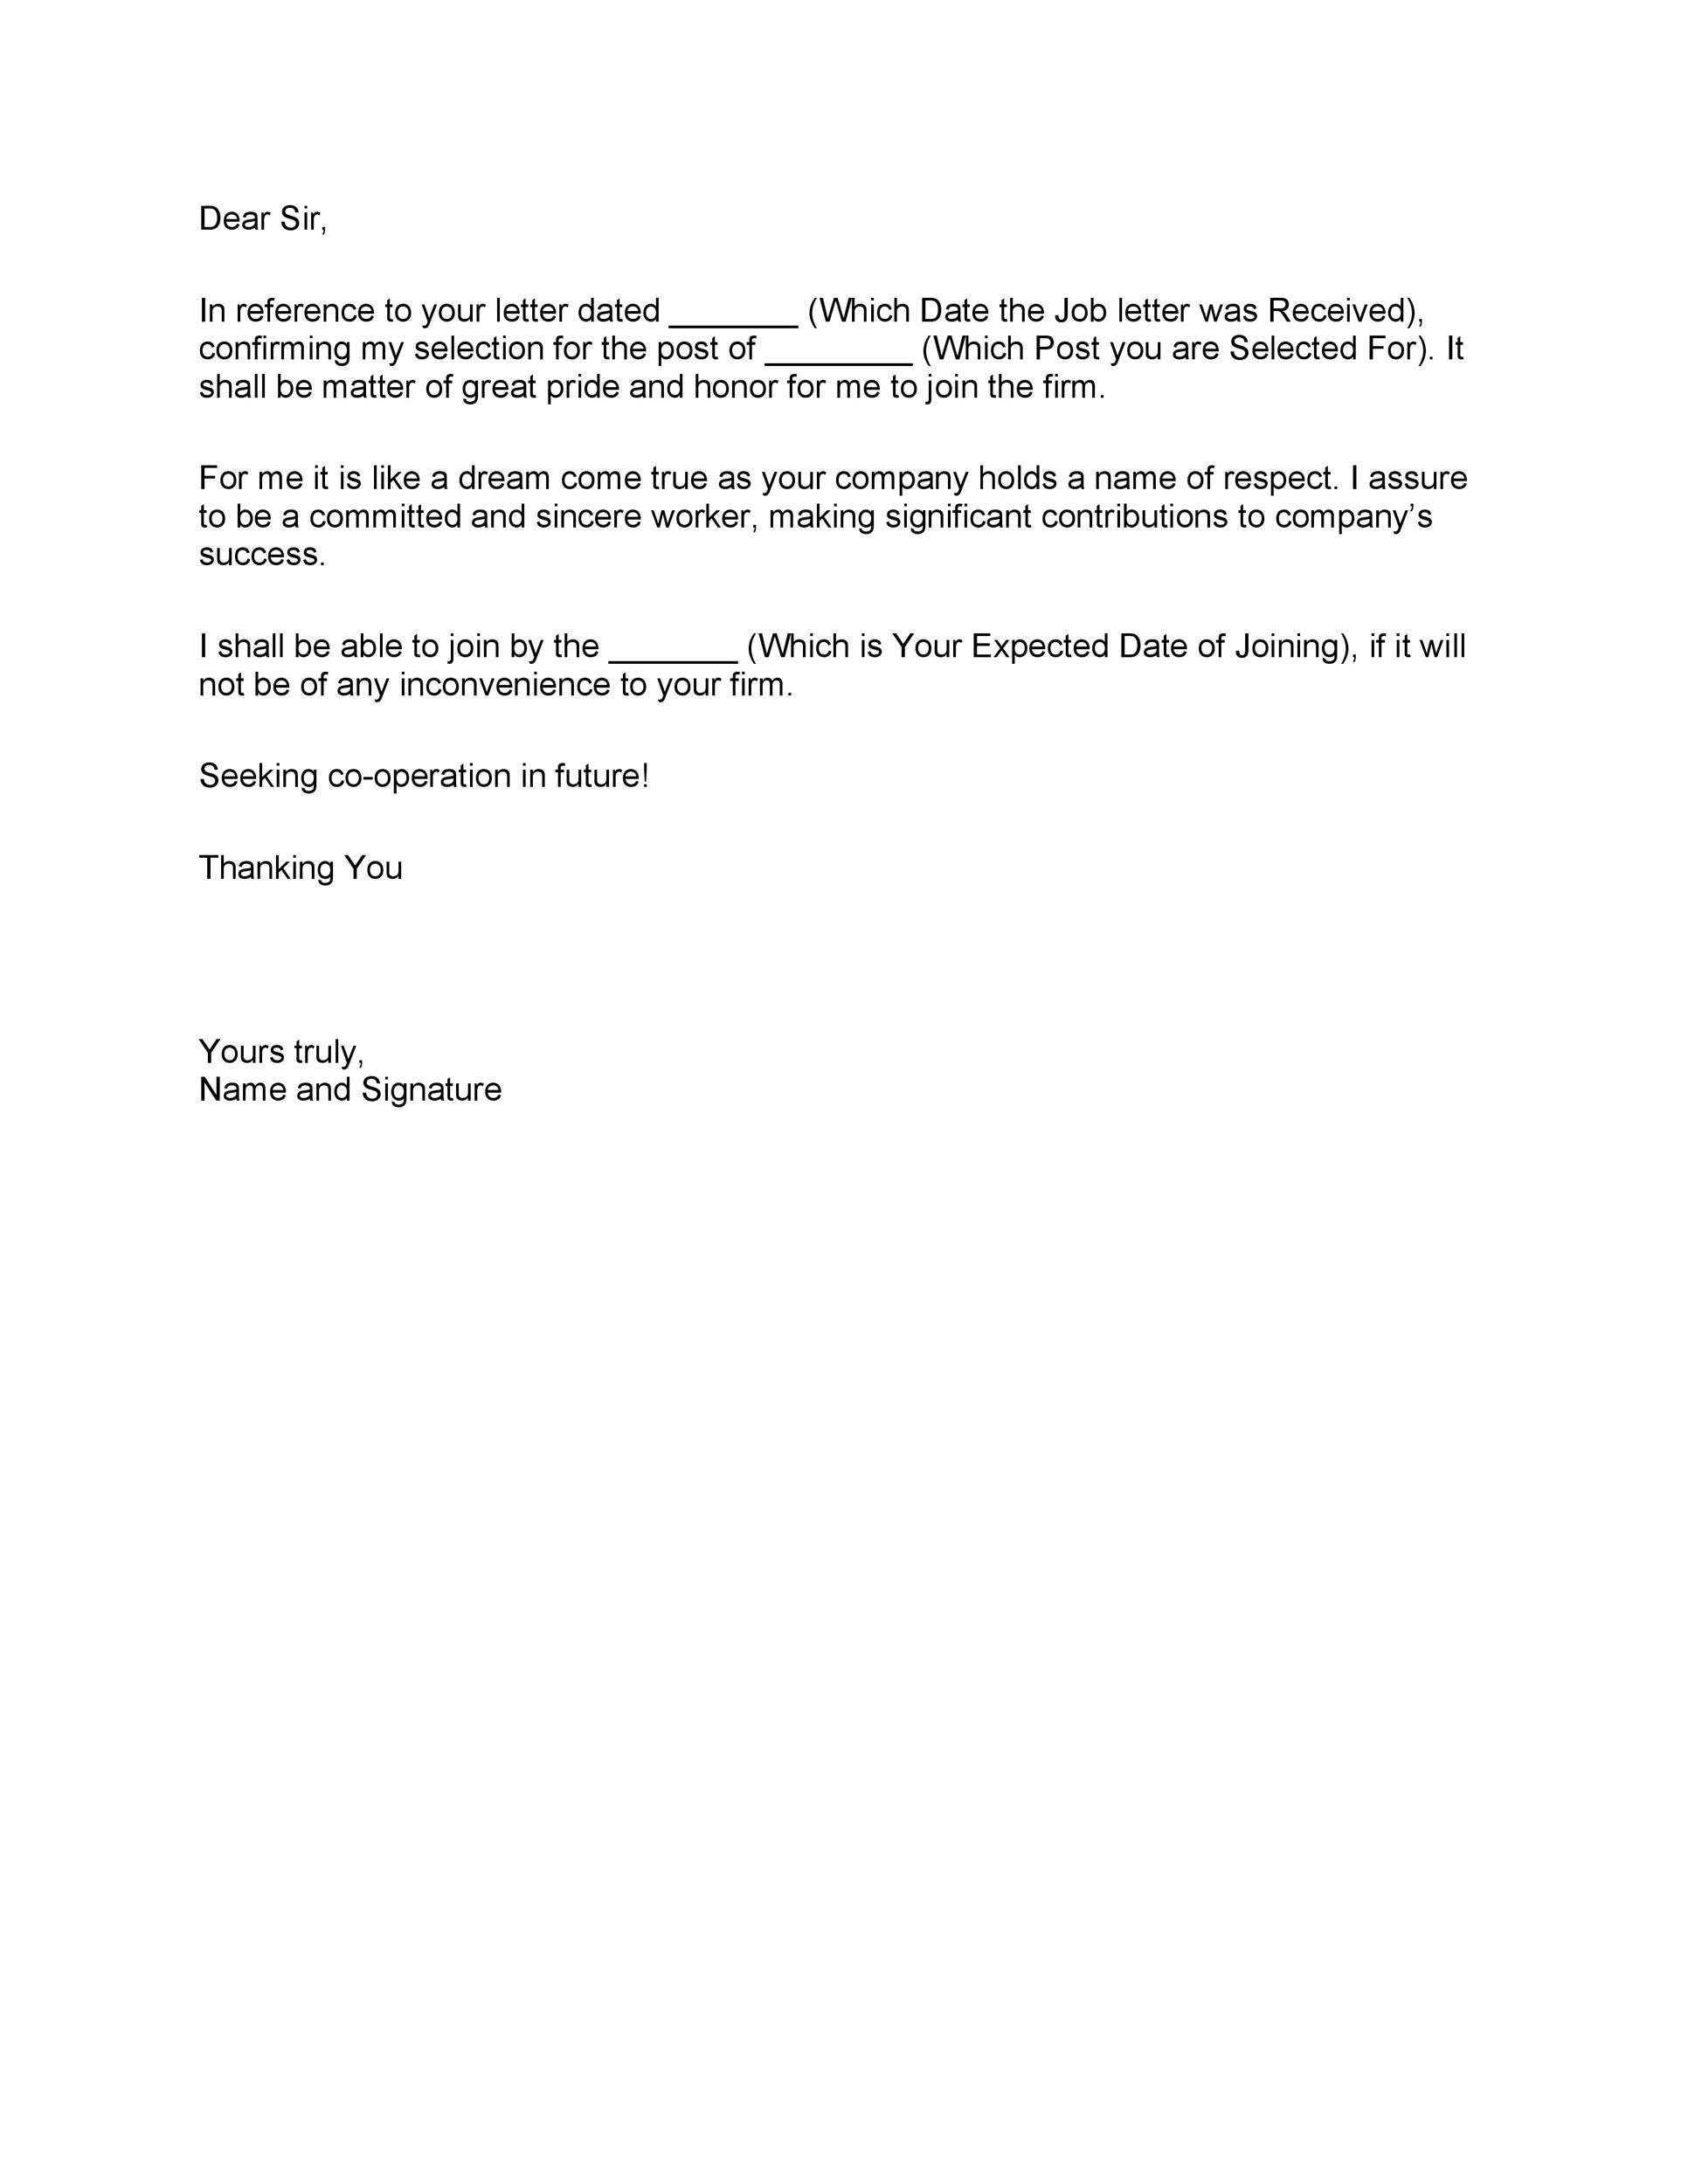 Free job acceptance letter 10